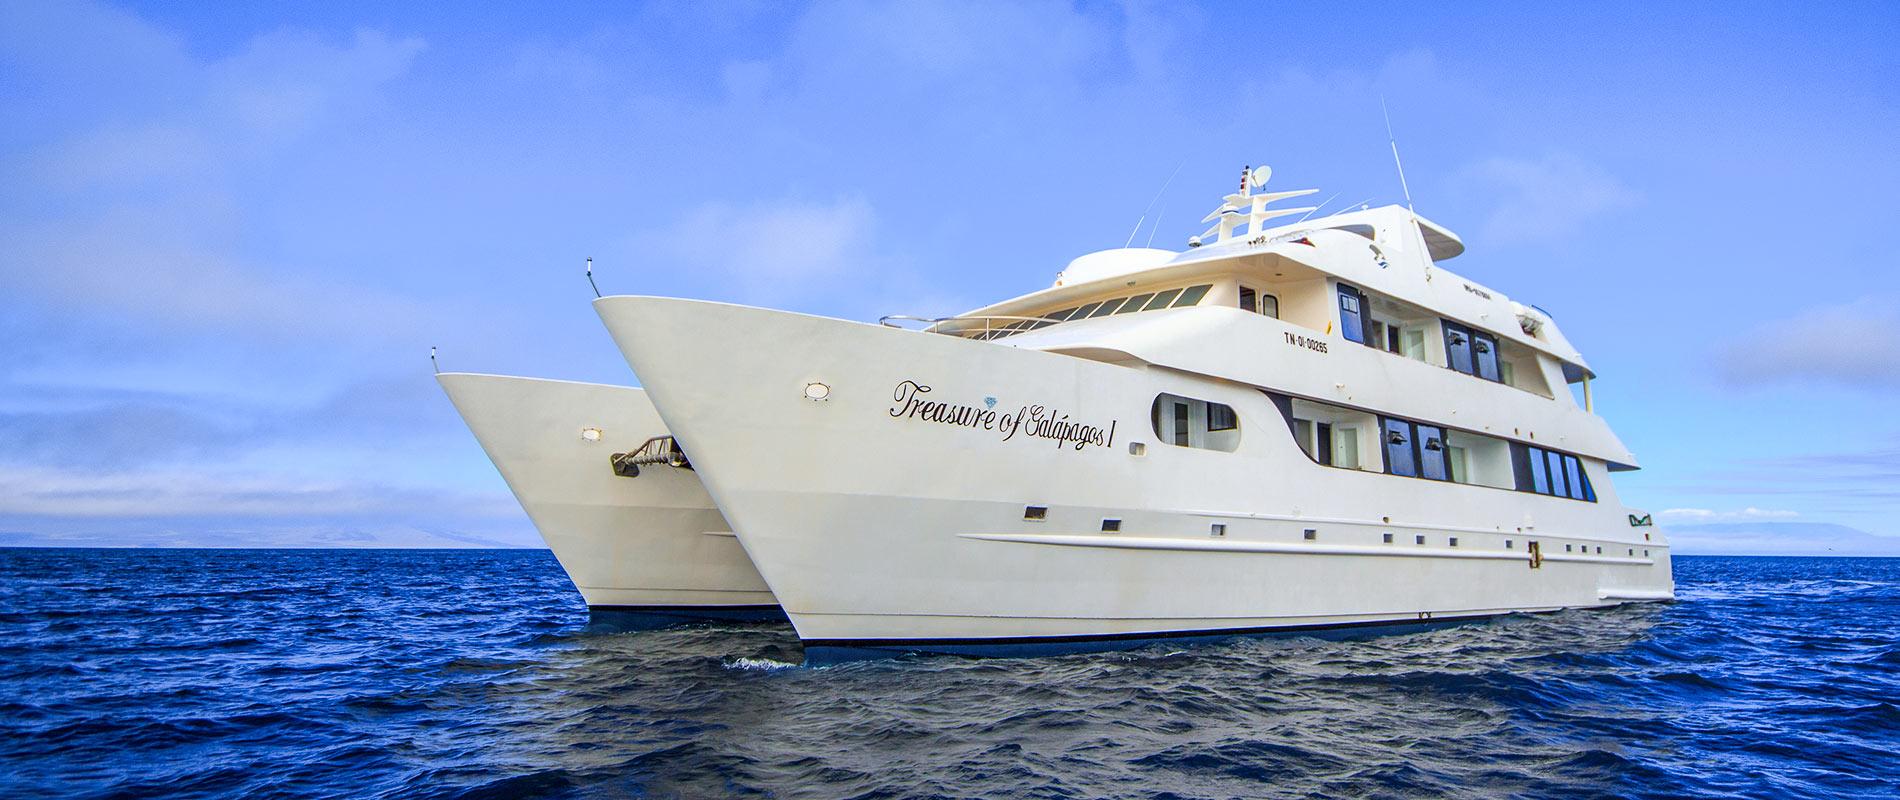 M/C Treasure of Galapagos